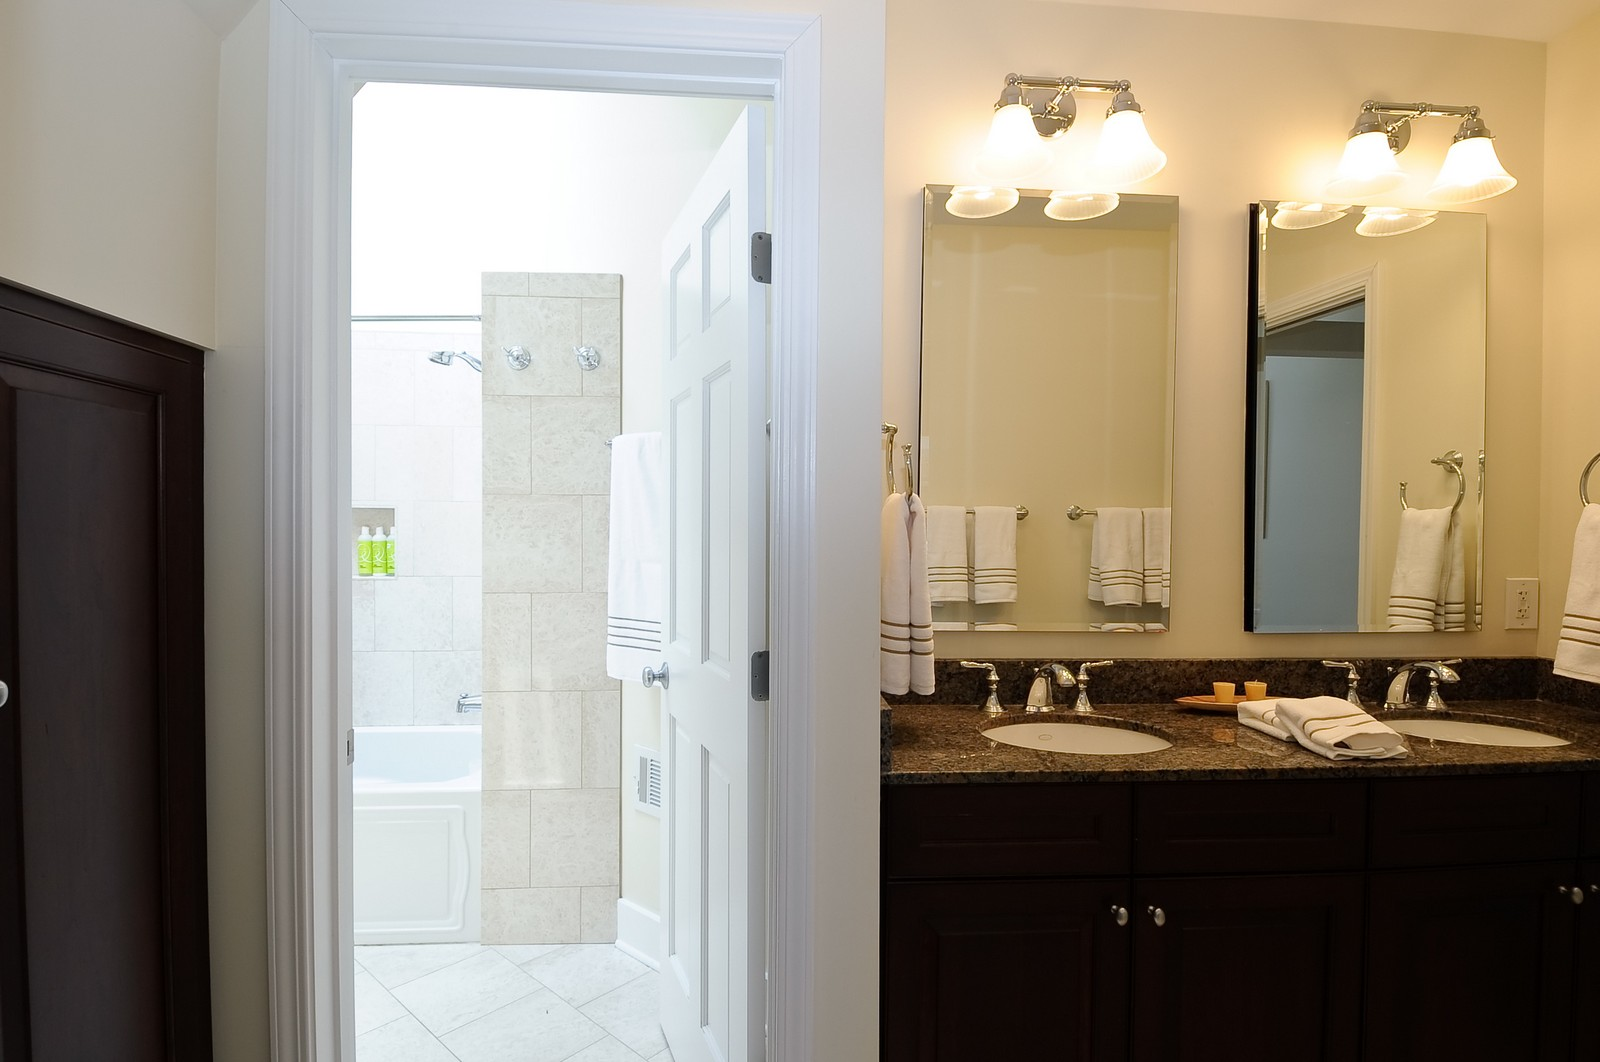 Real Estate Photography - 1144 W. Altgeld, Chicago, IL, 60614 - Master Bathroom